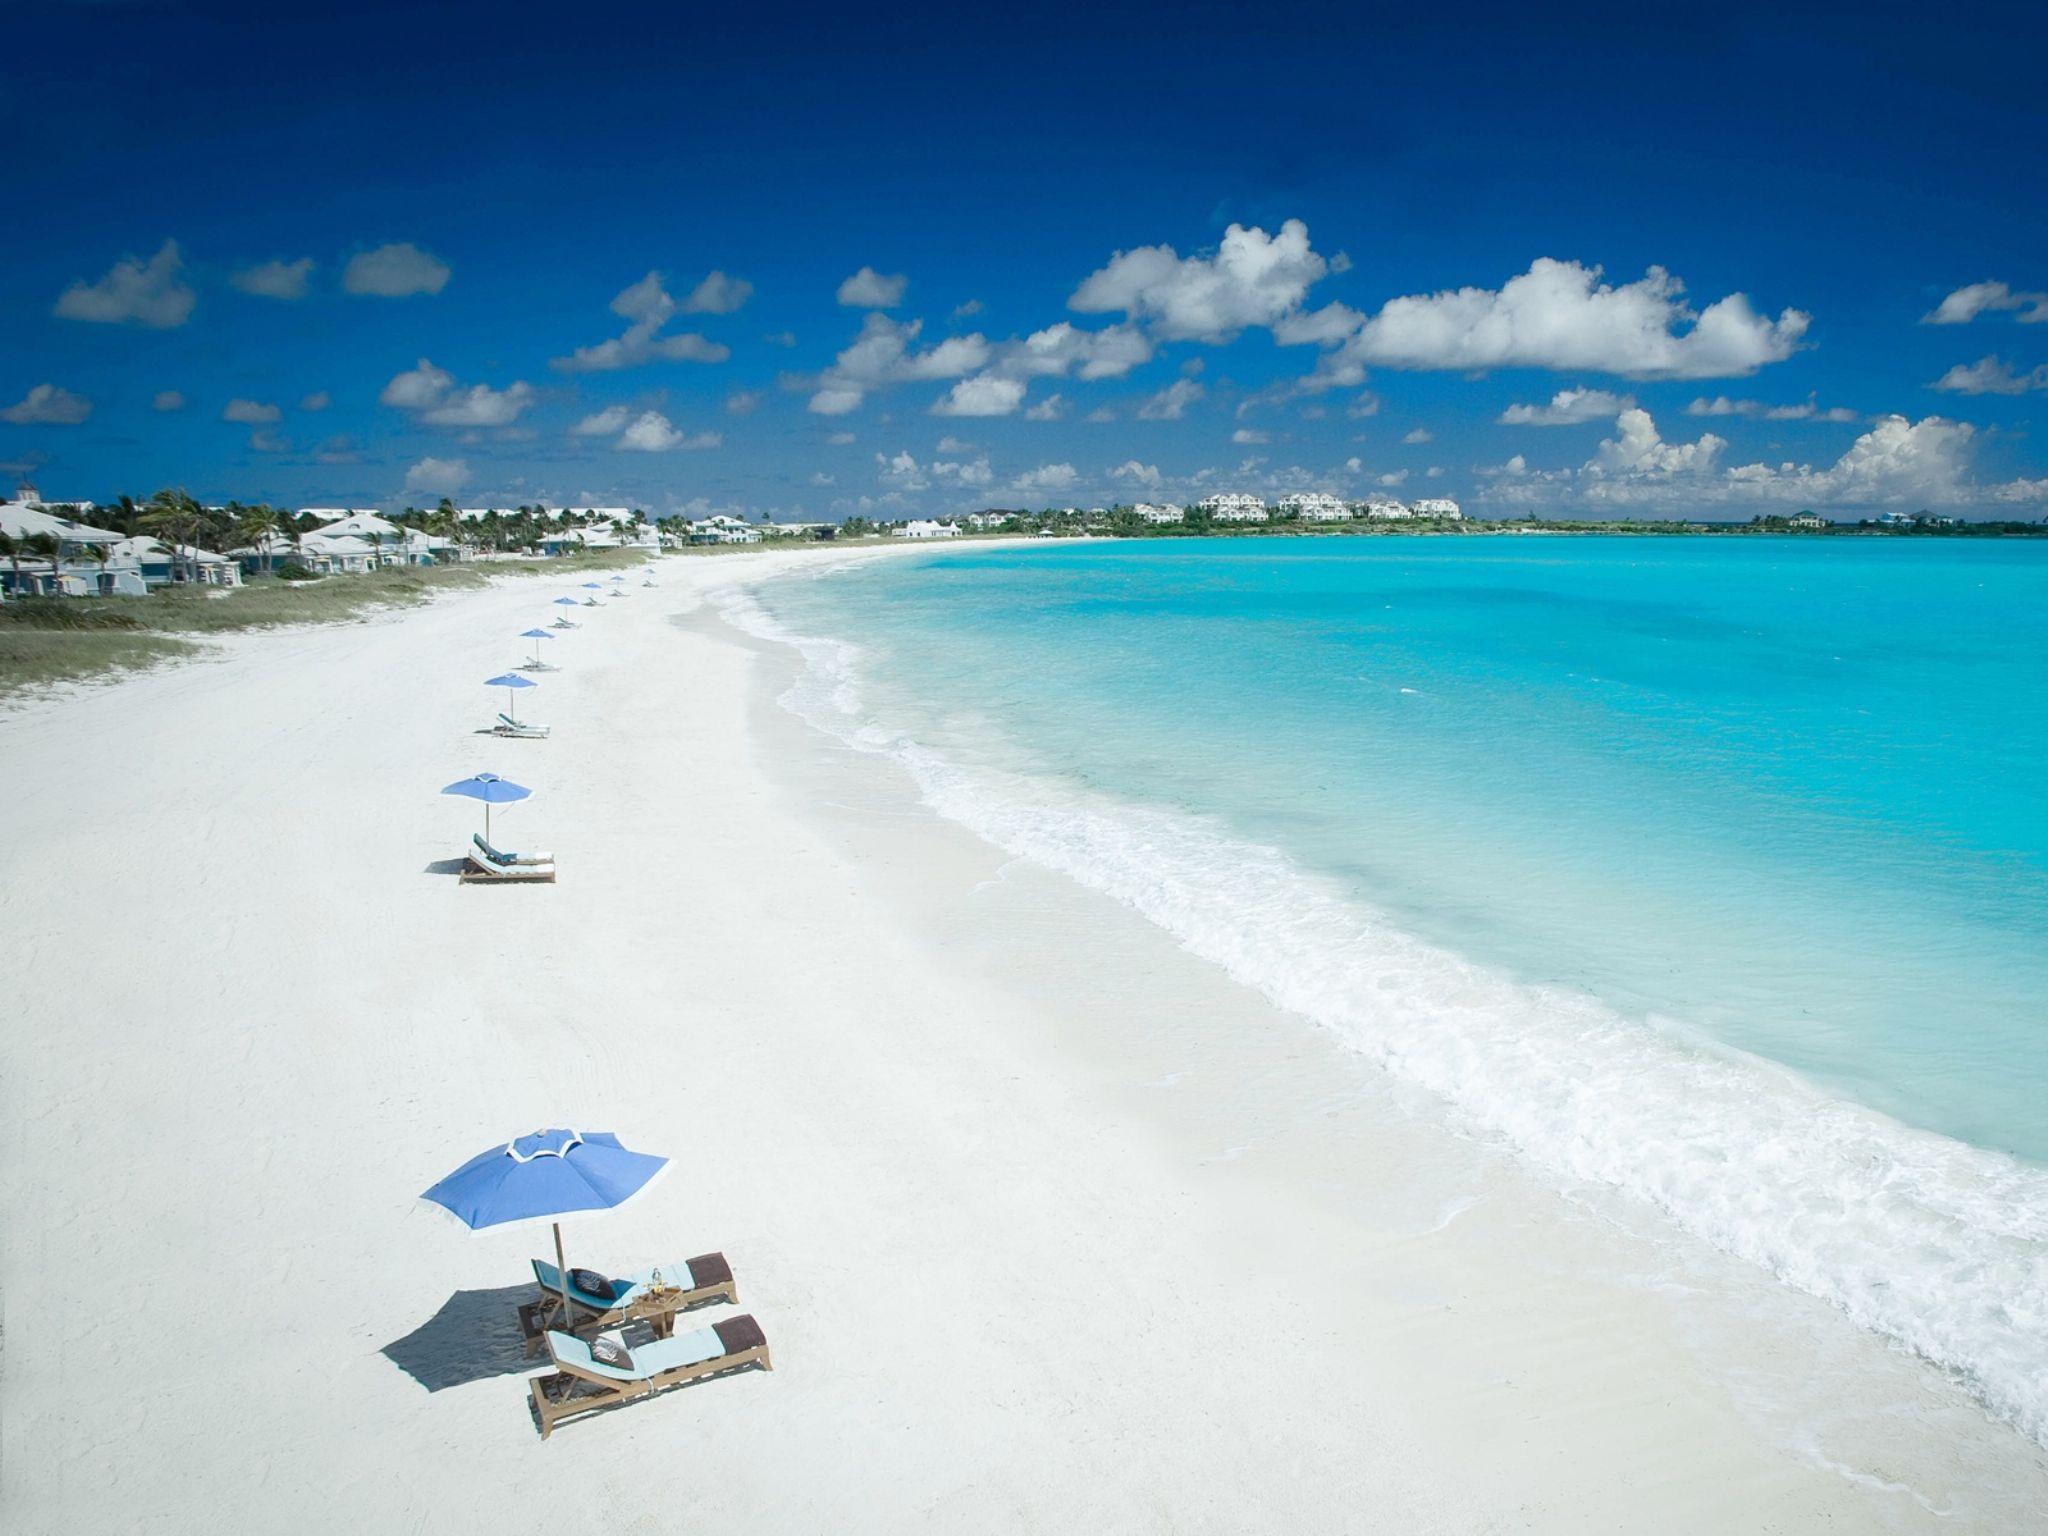 Exuma Bahamas Beach by Digital Kafe Photography